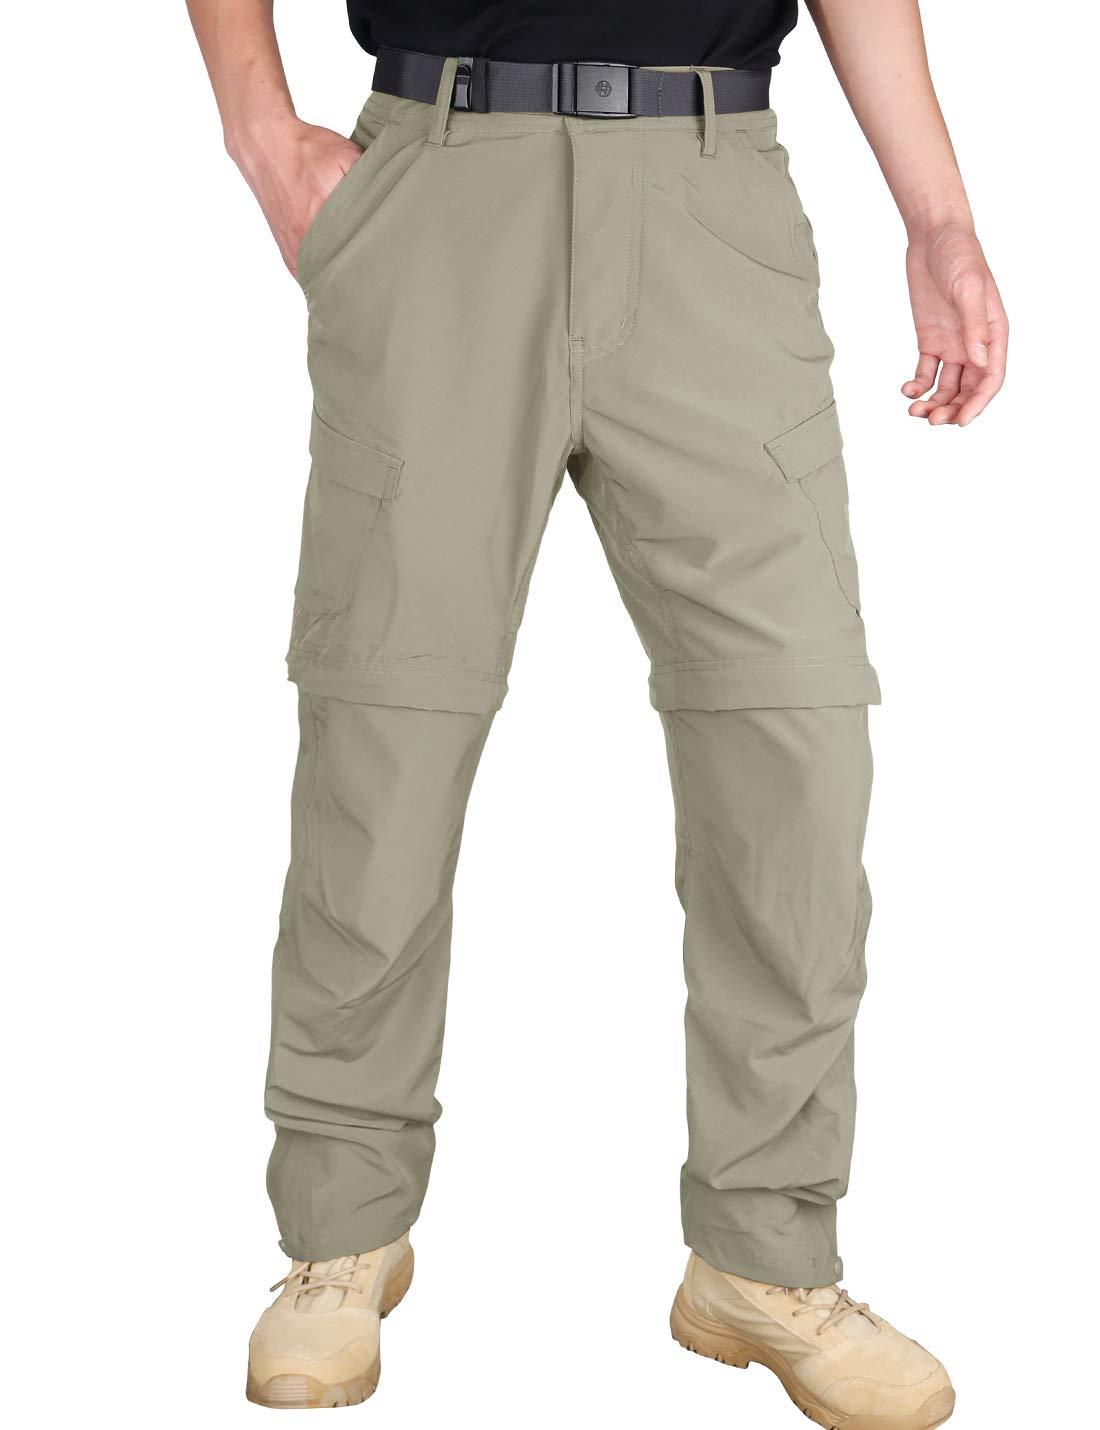 HARD LAND Hiking Pants Mens Convertible Quick Dry Lightweight Zip Off Travel Cargo Pants UV Protection Zipper Legs Khaki 38W×32L by HARD LAND